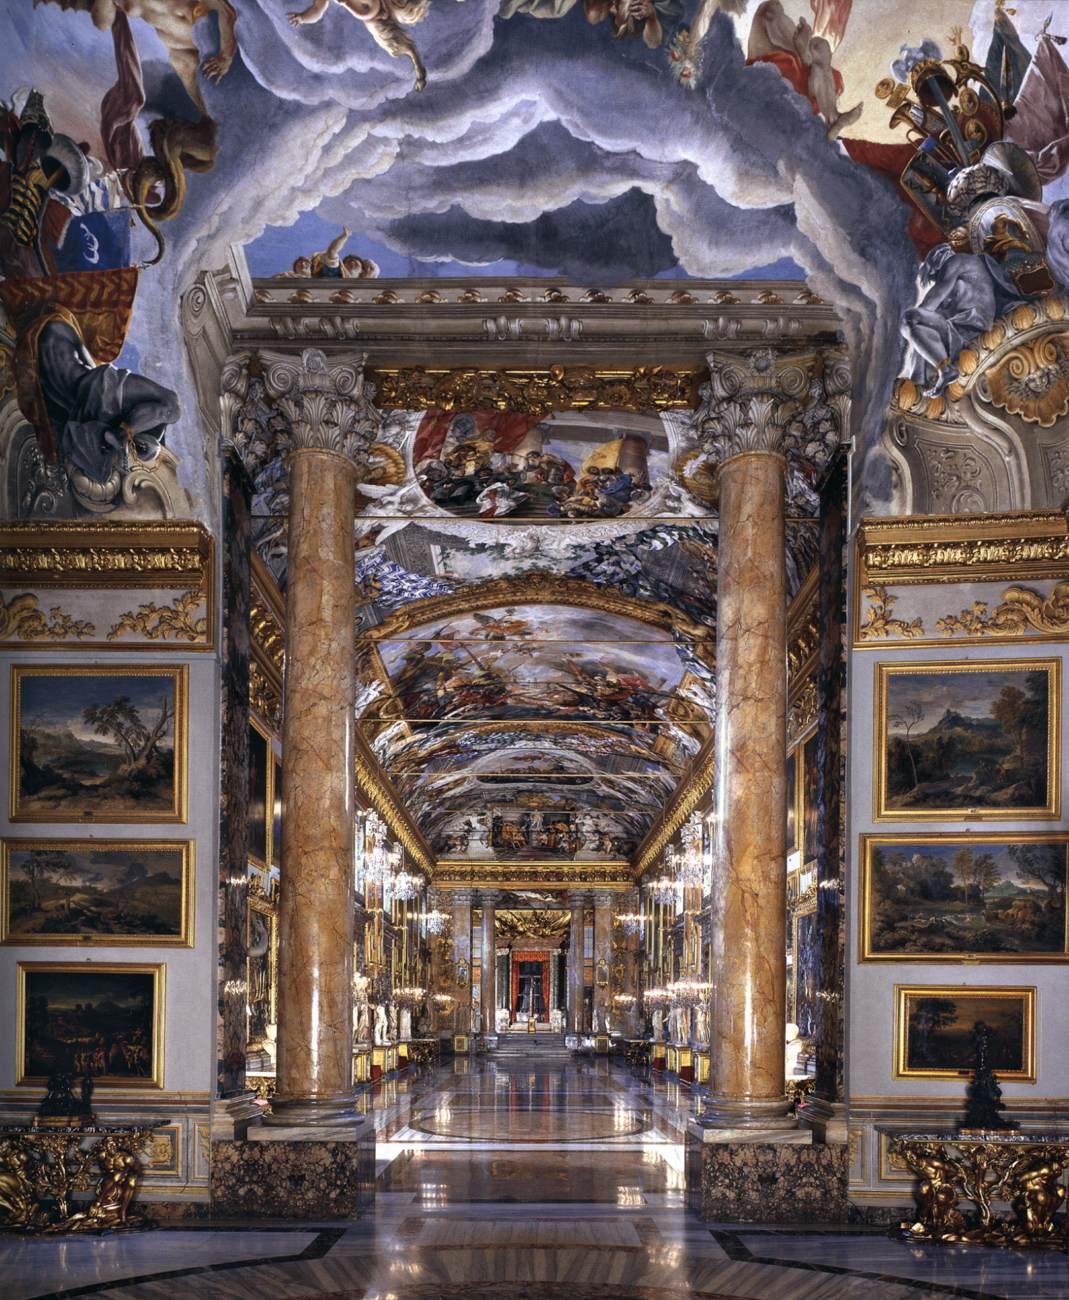 Johann Paul Schor, Grande Galleria, Palazzo Colonna, Rome